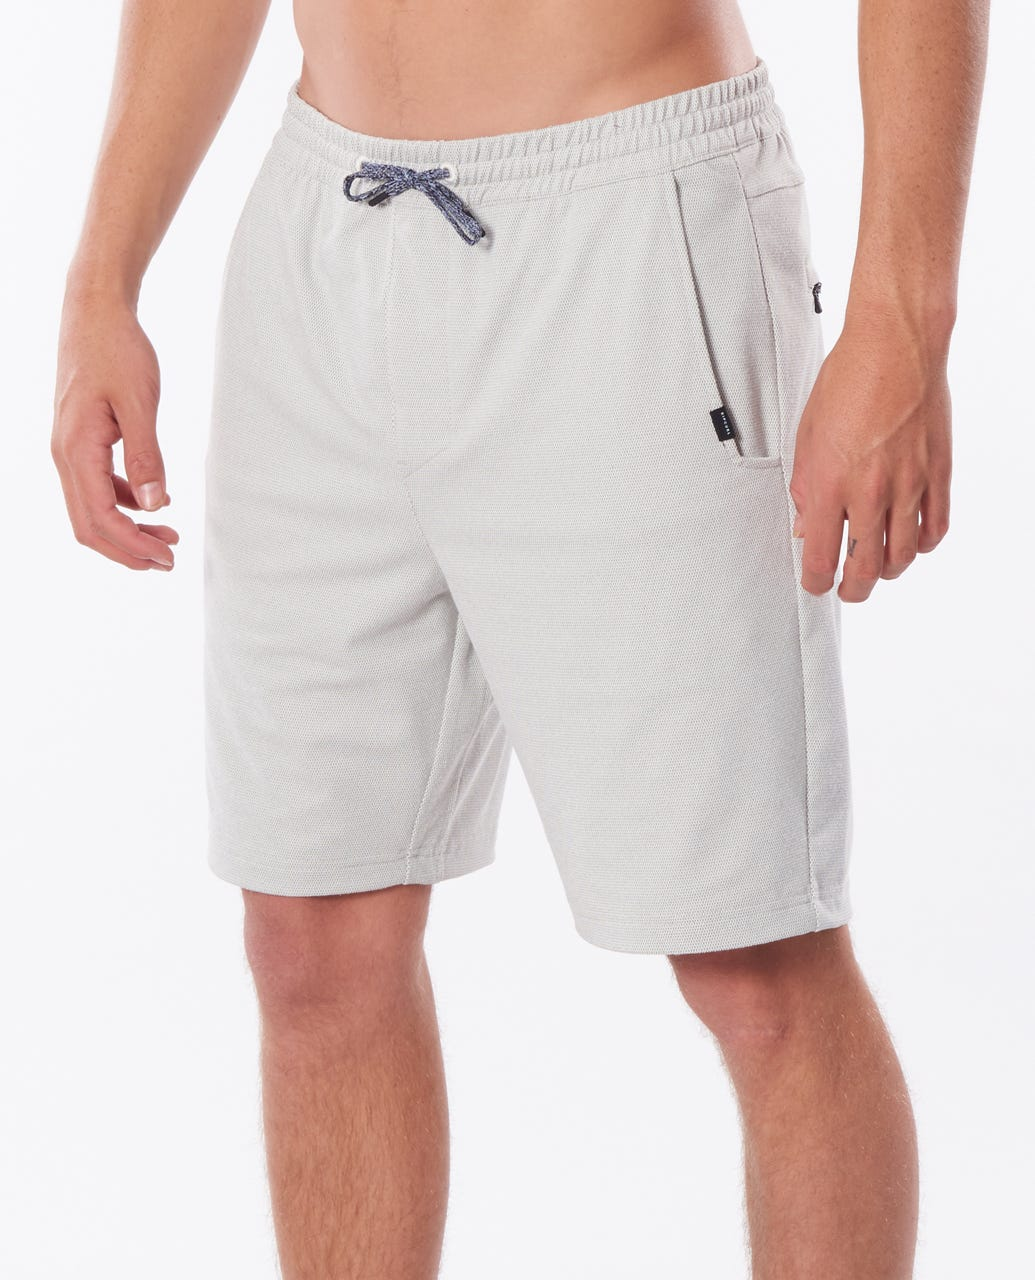 RIP CURL 2020//21 Mens Premium Track Sports Training Running Walk Shorts Cotton